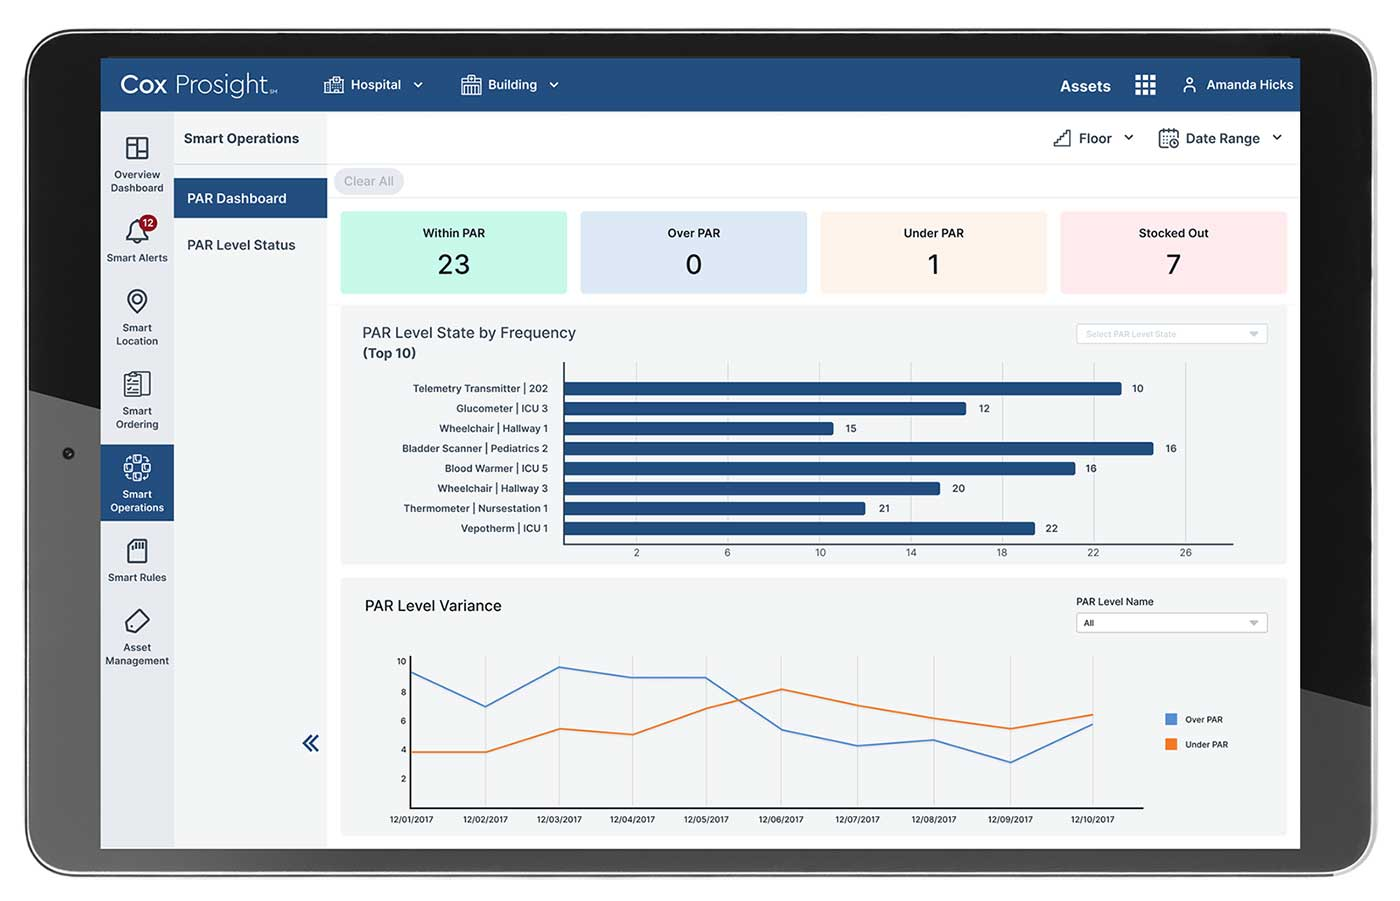 screenshot of Cox Prosight Smart Operations